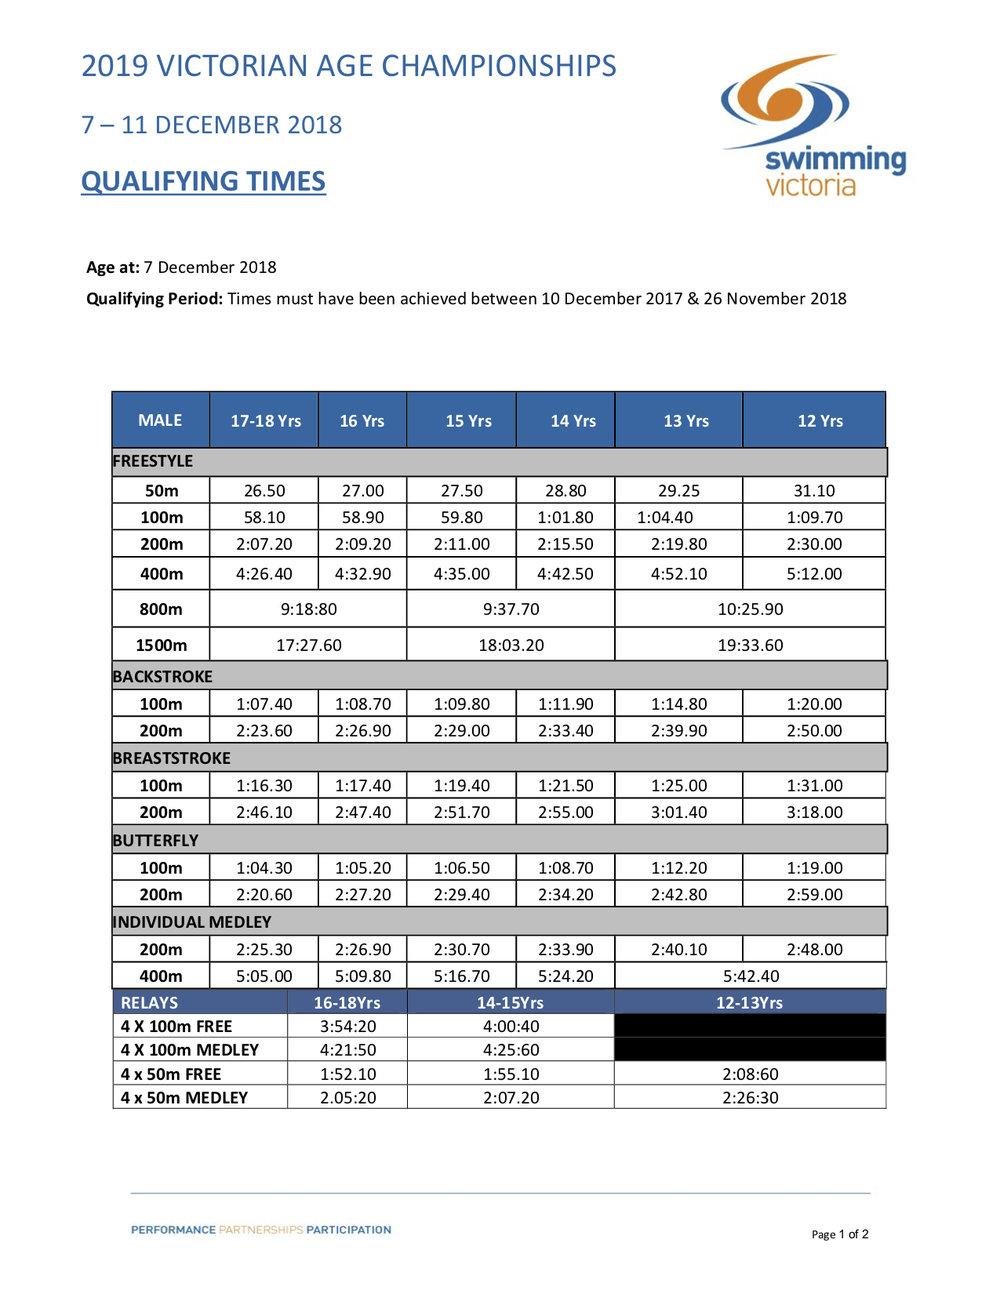 2019_Vic_Age_Championships_QT's pg1.jpg